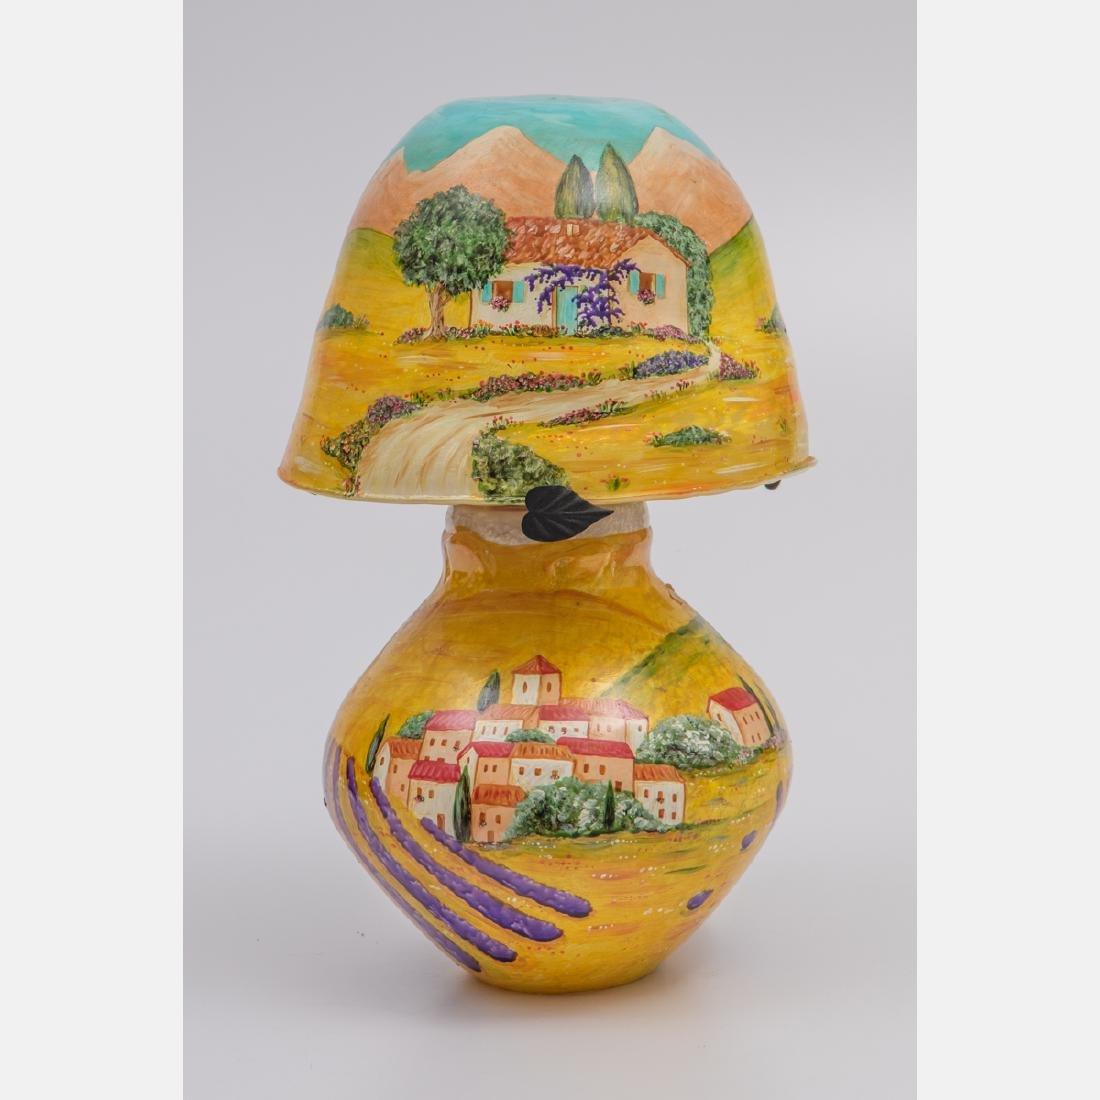 Jean-Claude Novaro (1948-2014) Table Lamp Depicting a